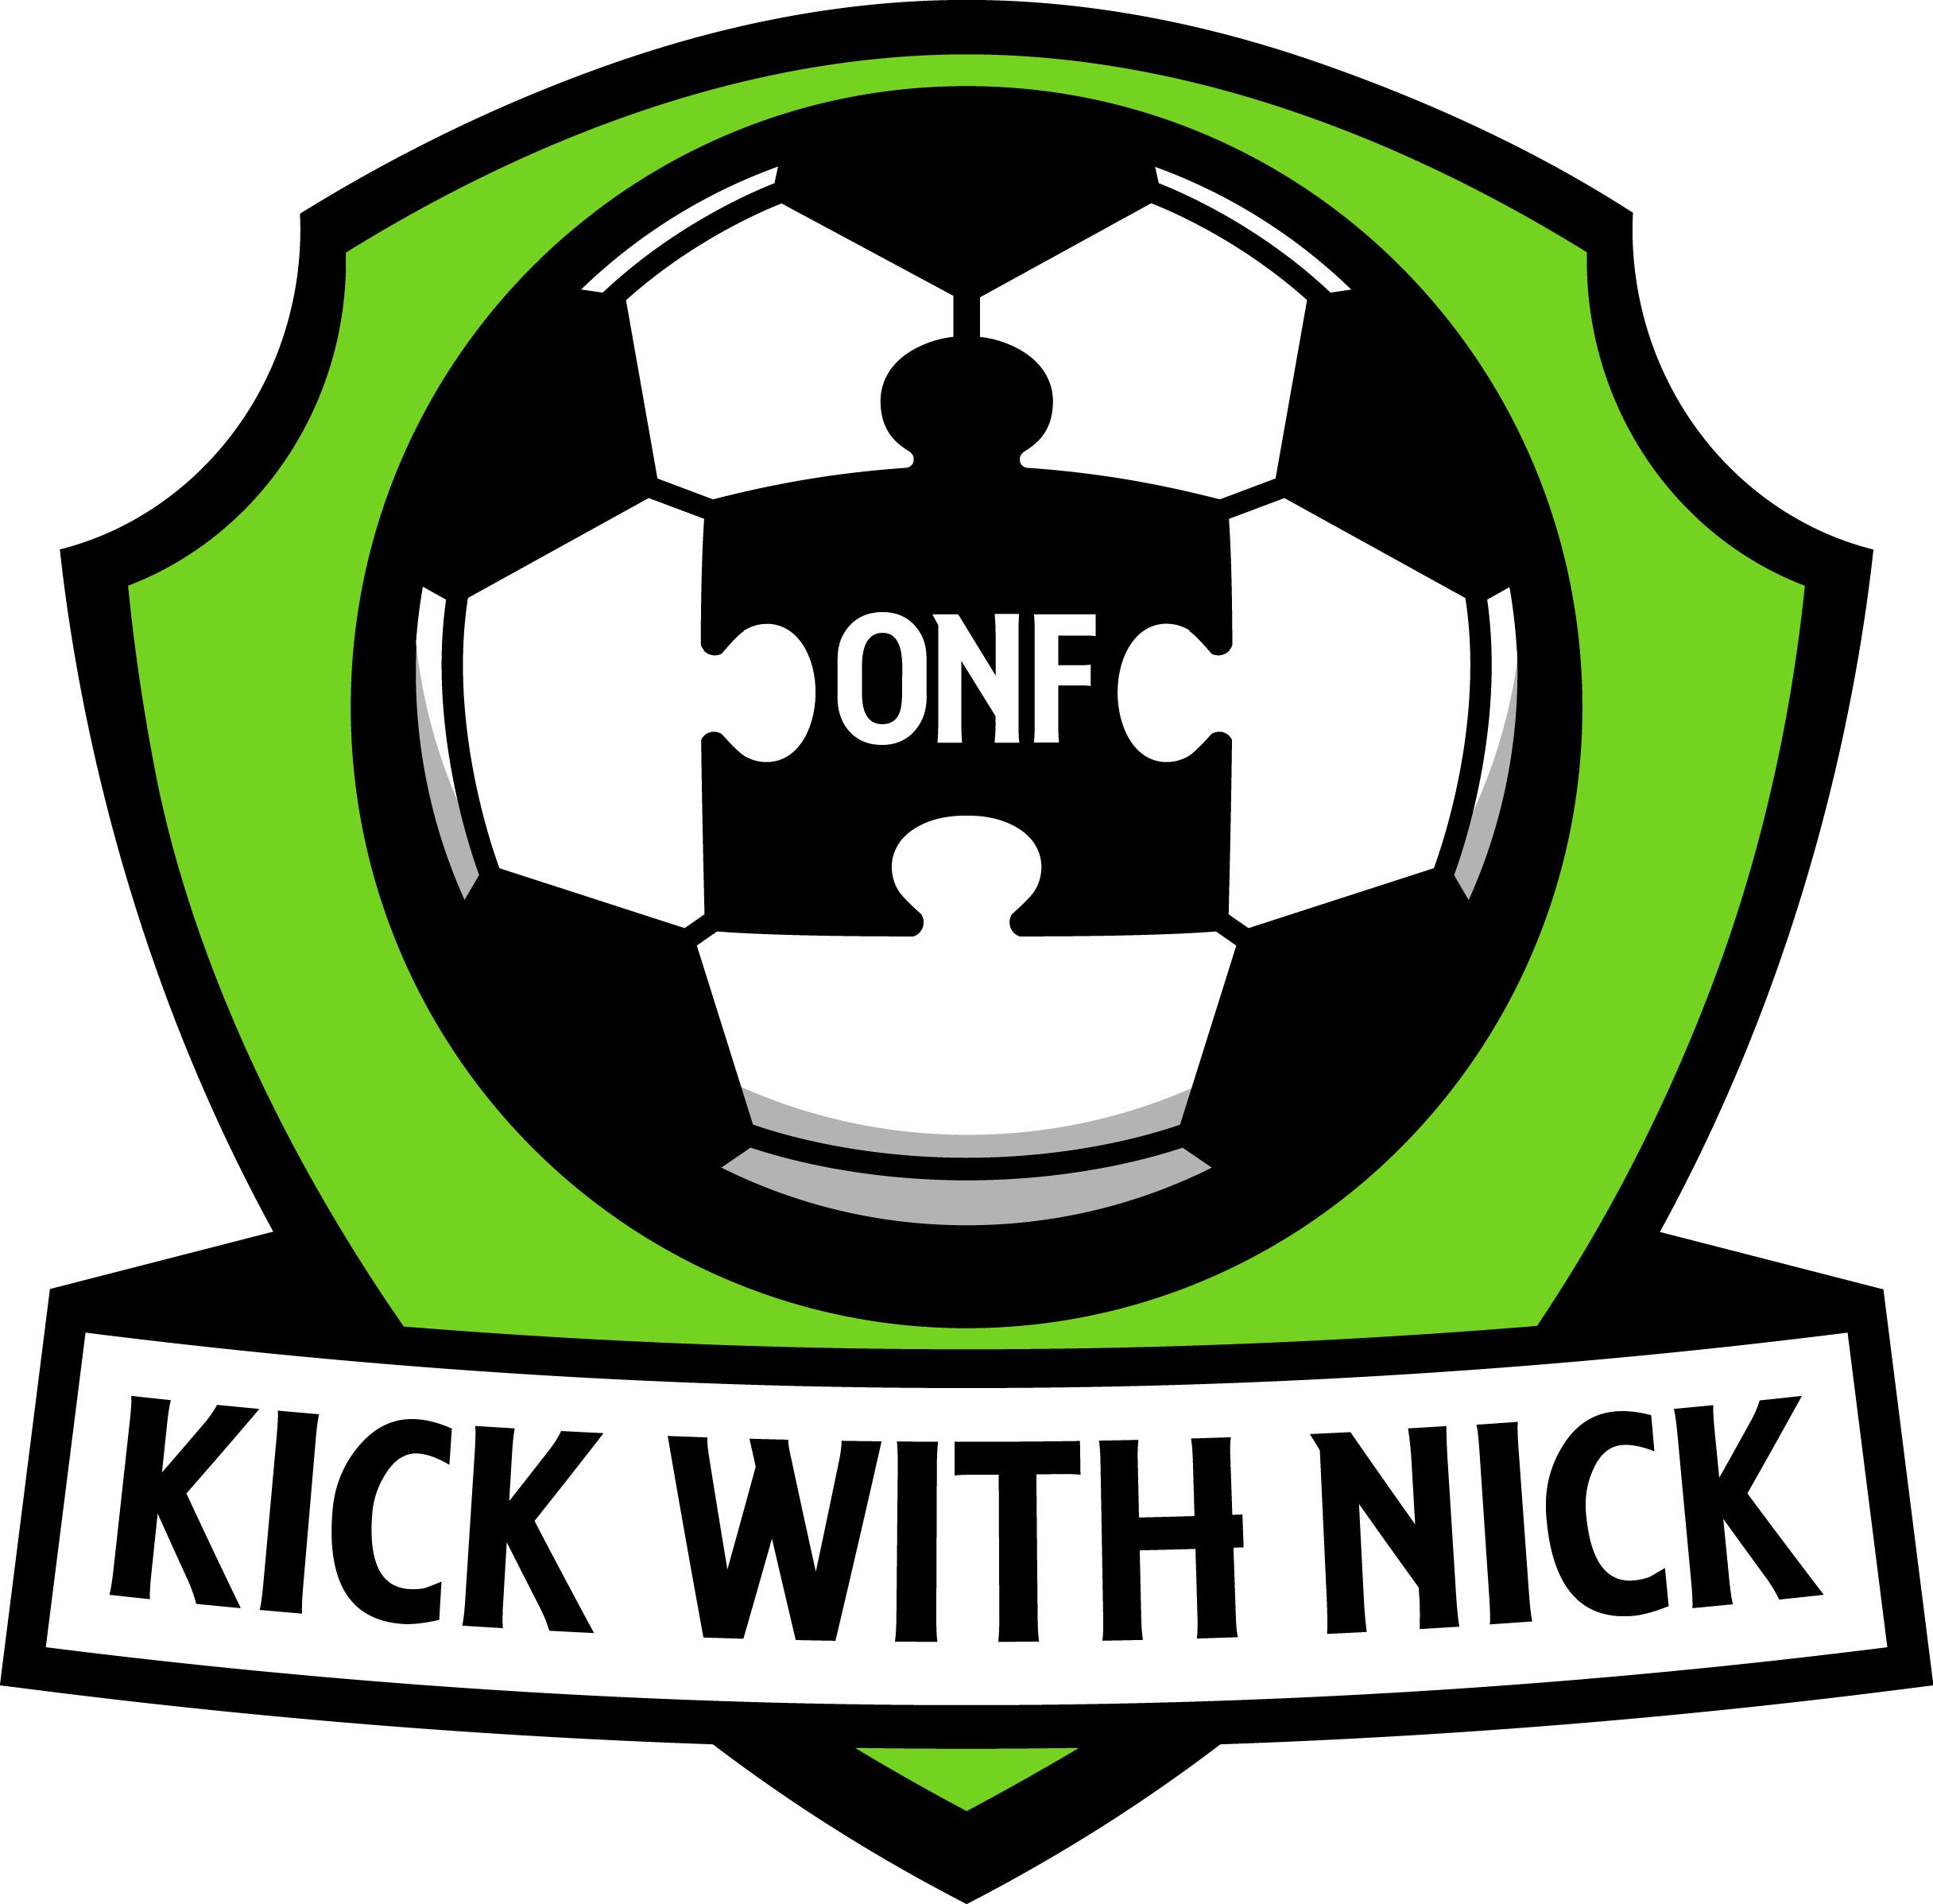 Kick With Nick Logo (1).jpg